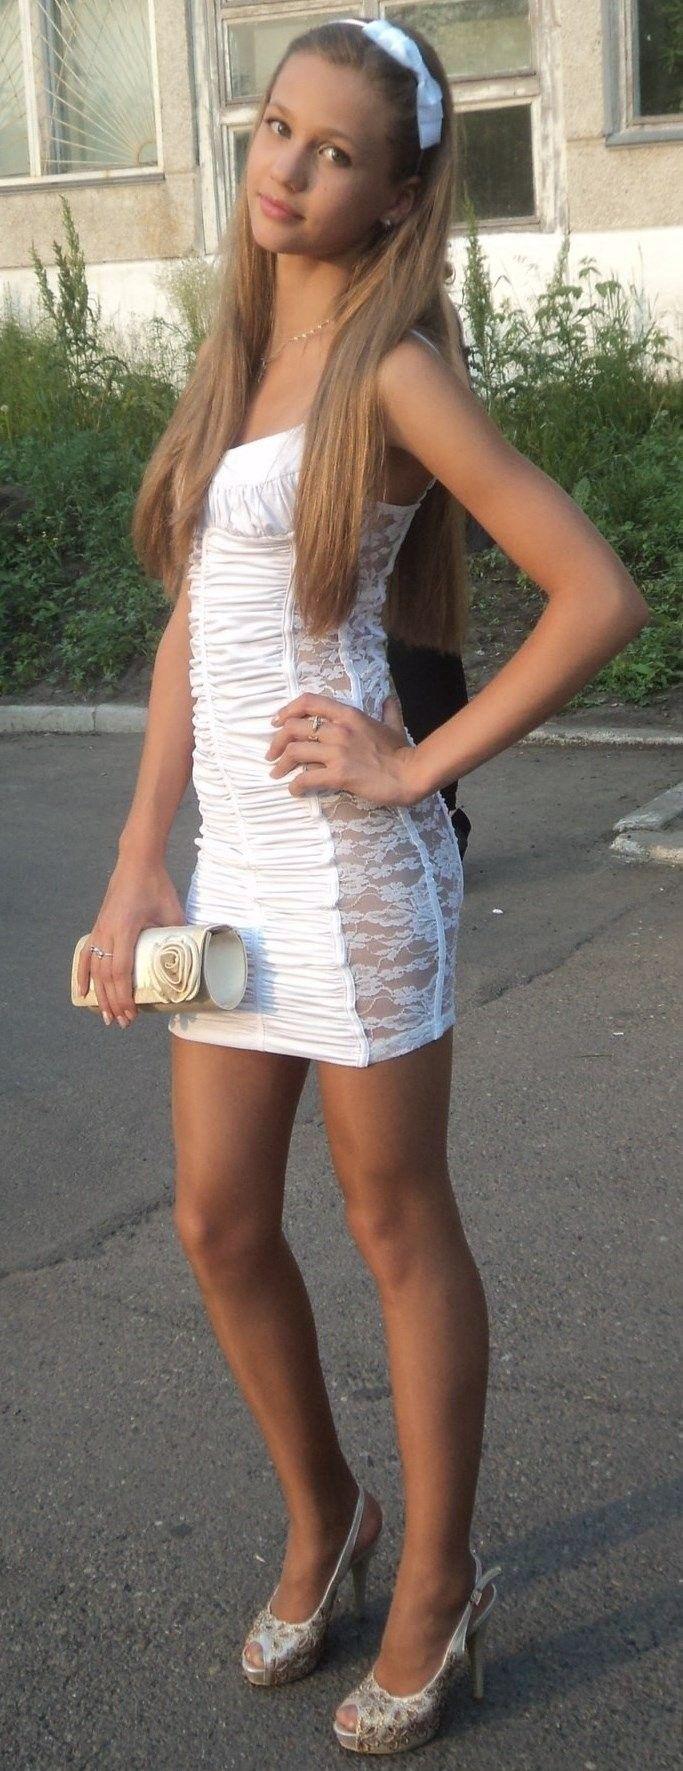 Jailbait white skirt, picture of three boobs